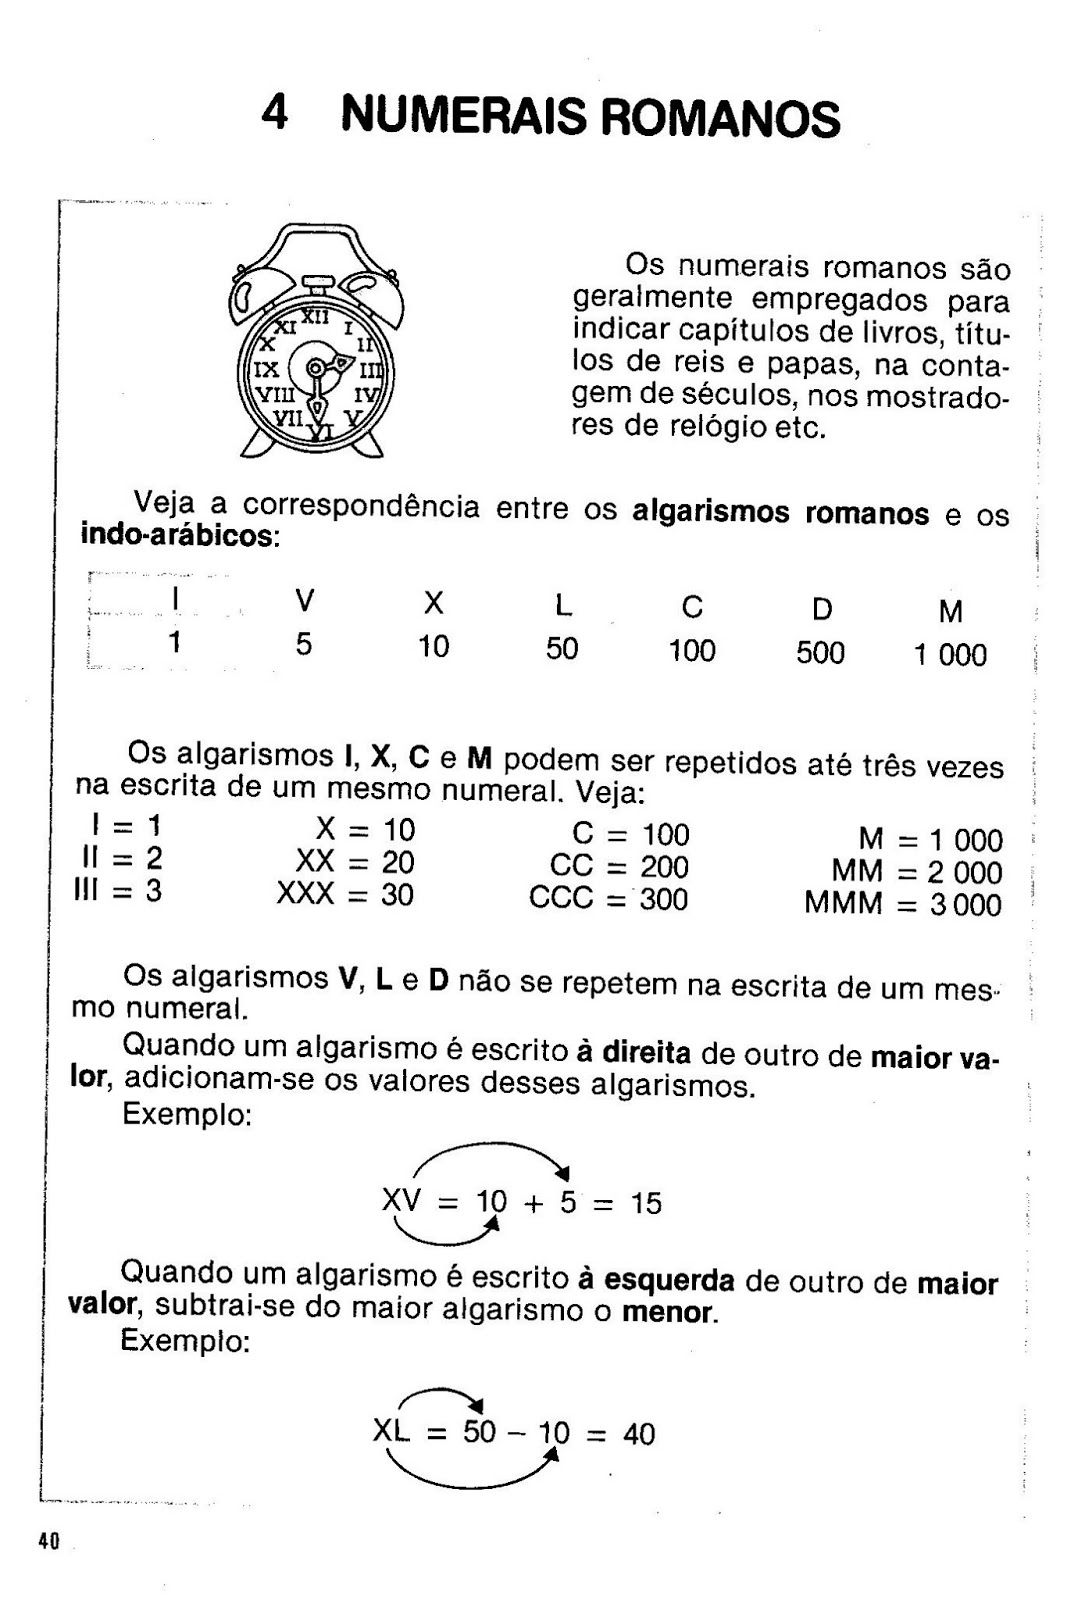 Oioooo Jpg 1085 1600 Algarismos Romanos Numeral Romano